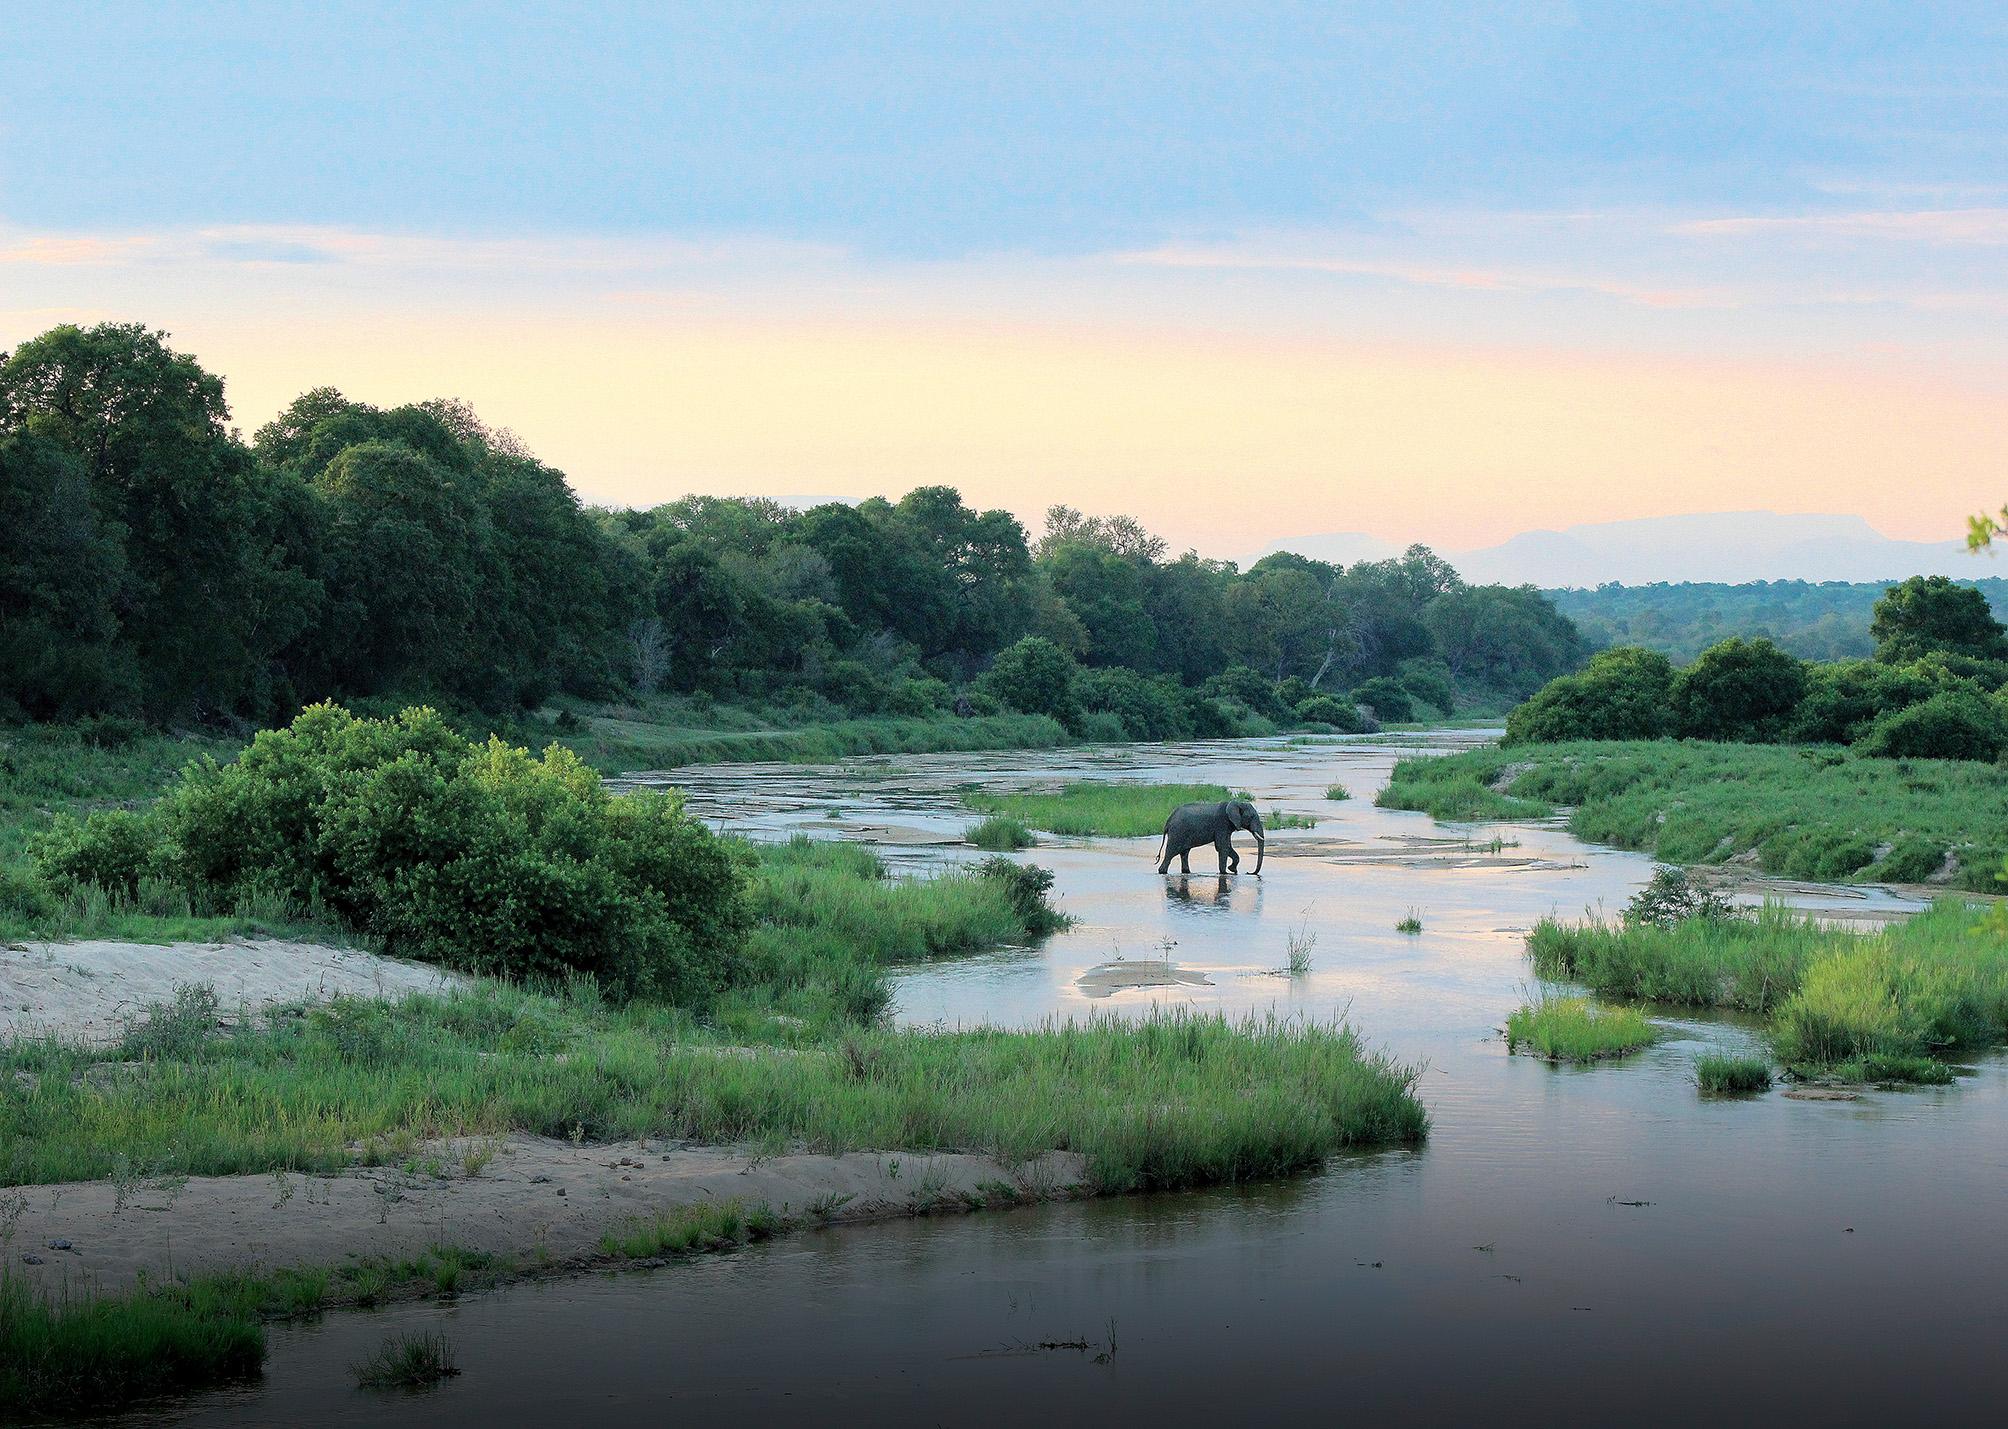 elephant-in-river-kiaraLEOPERD311.jpeg